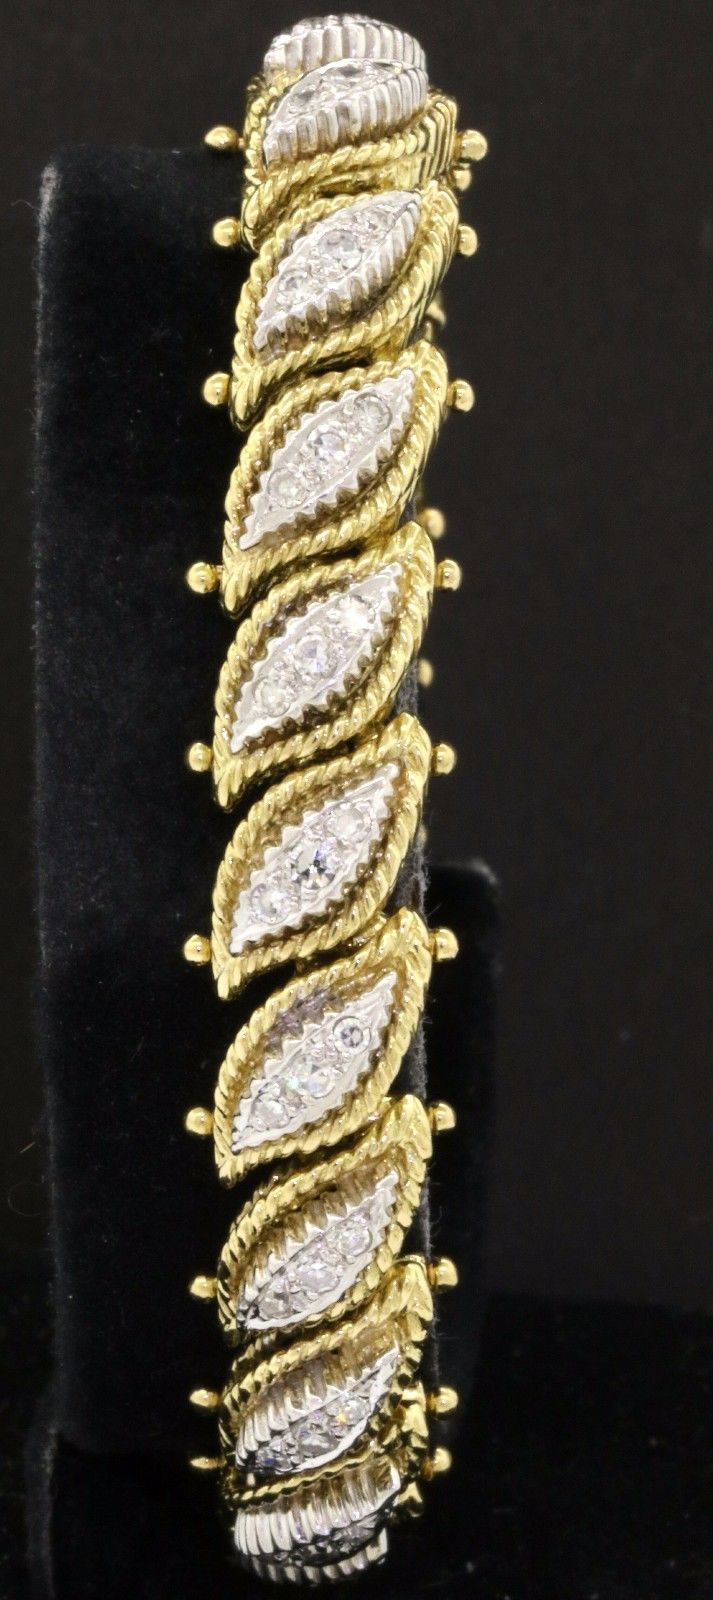 Designer hallmarked vintage heavy 18K 2-tone gold 2.0CT VS diamond link bracelet https://t.co/PD7Q96u0Xm https://t.co/zZWZ3a9nJY